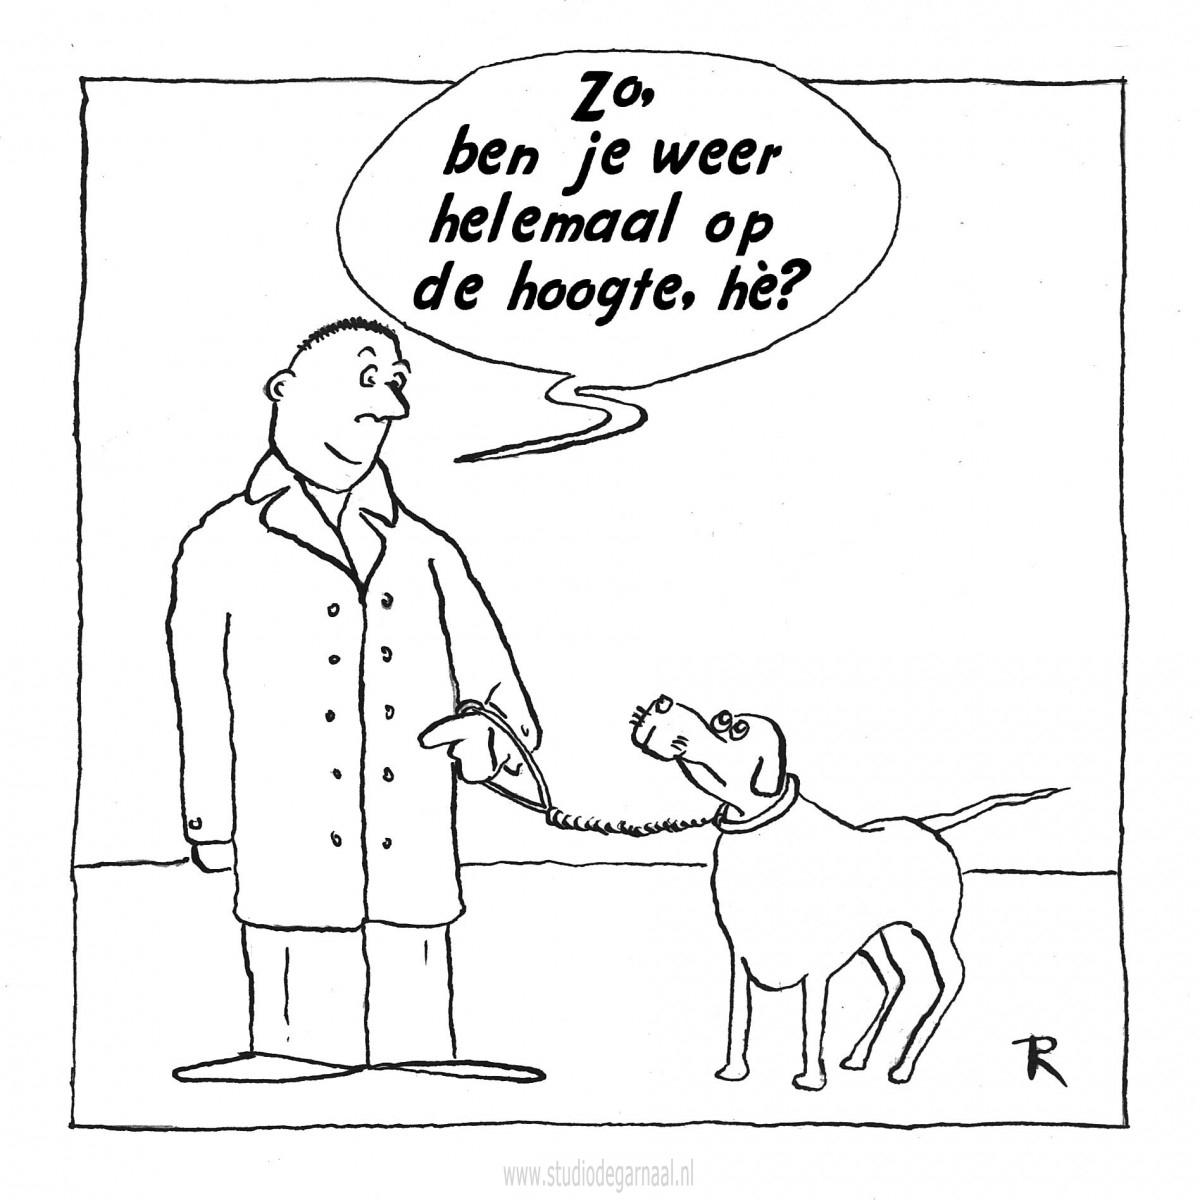 Feedback  - Cartoons door cartoonist & illustrator Ronald Oudman